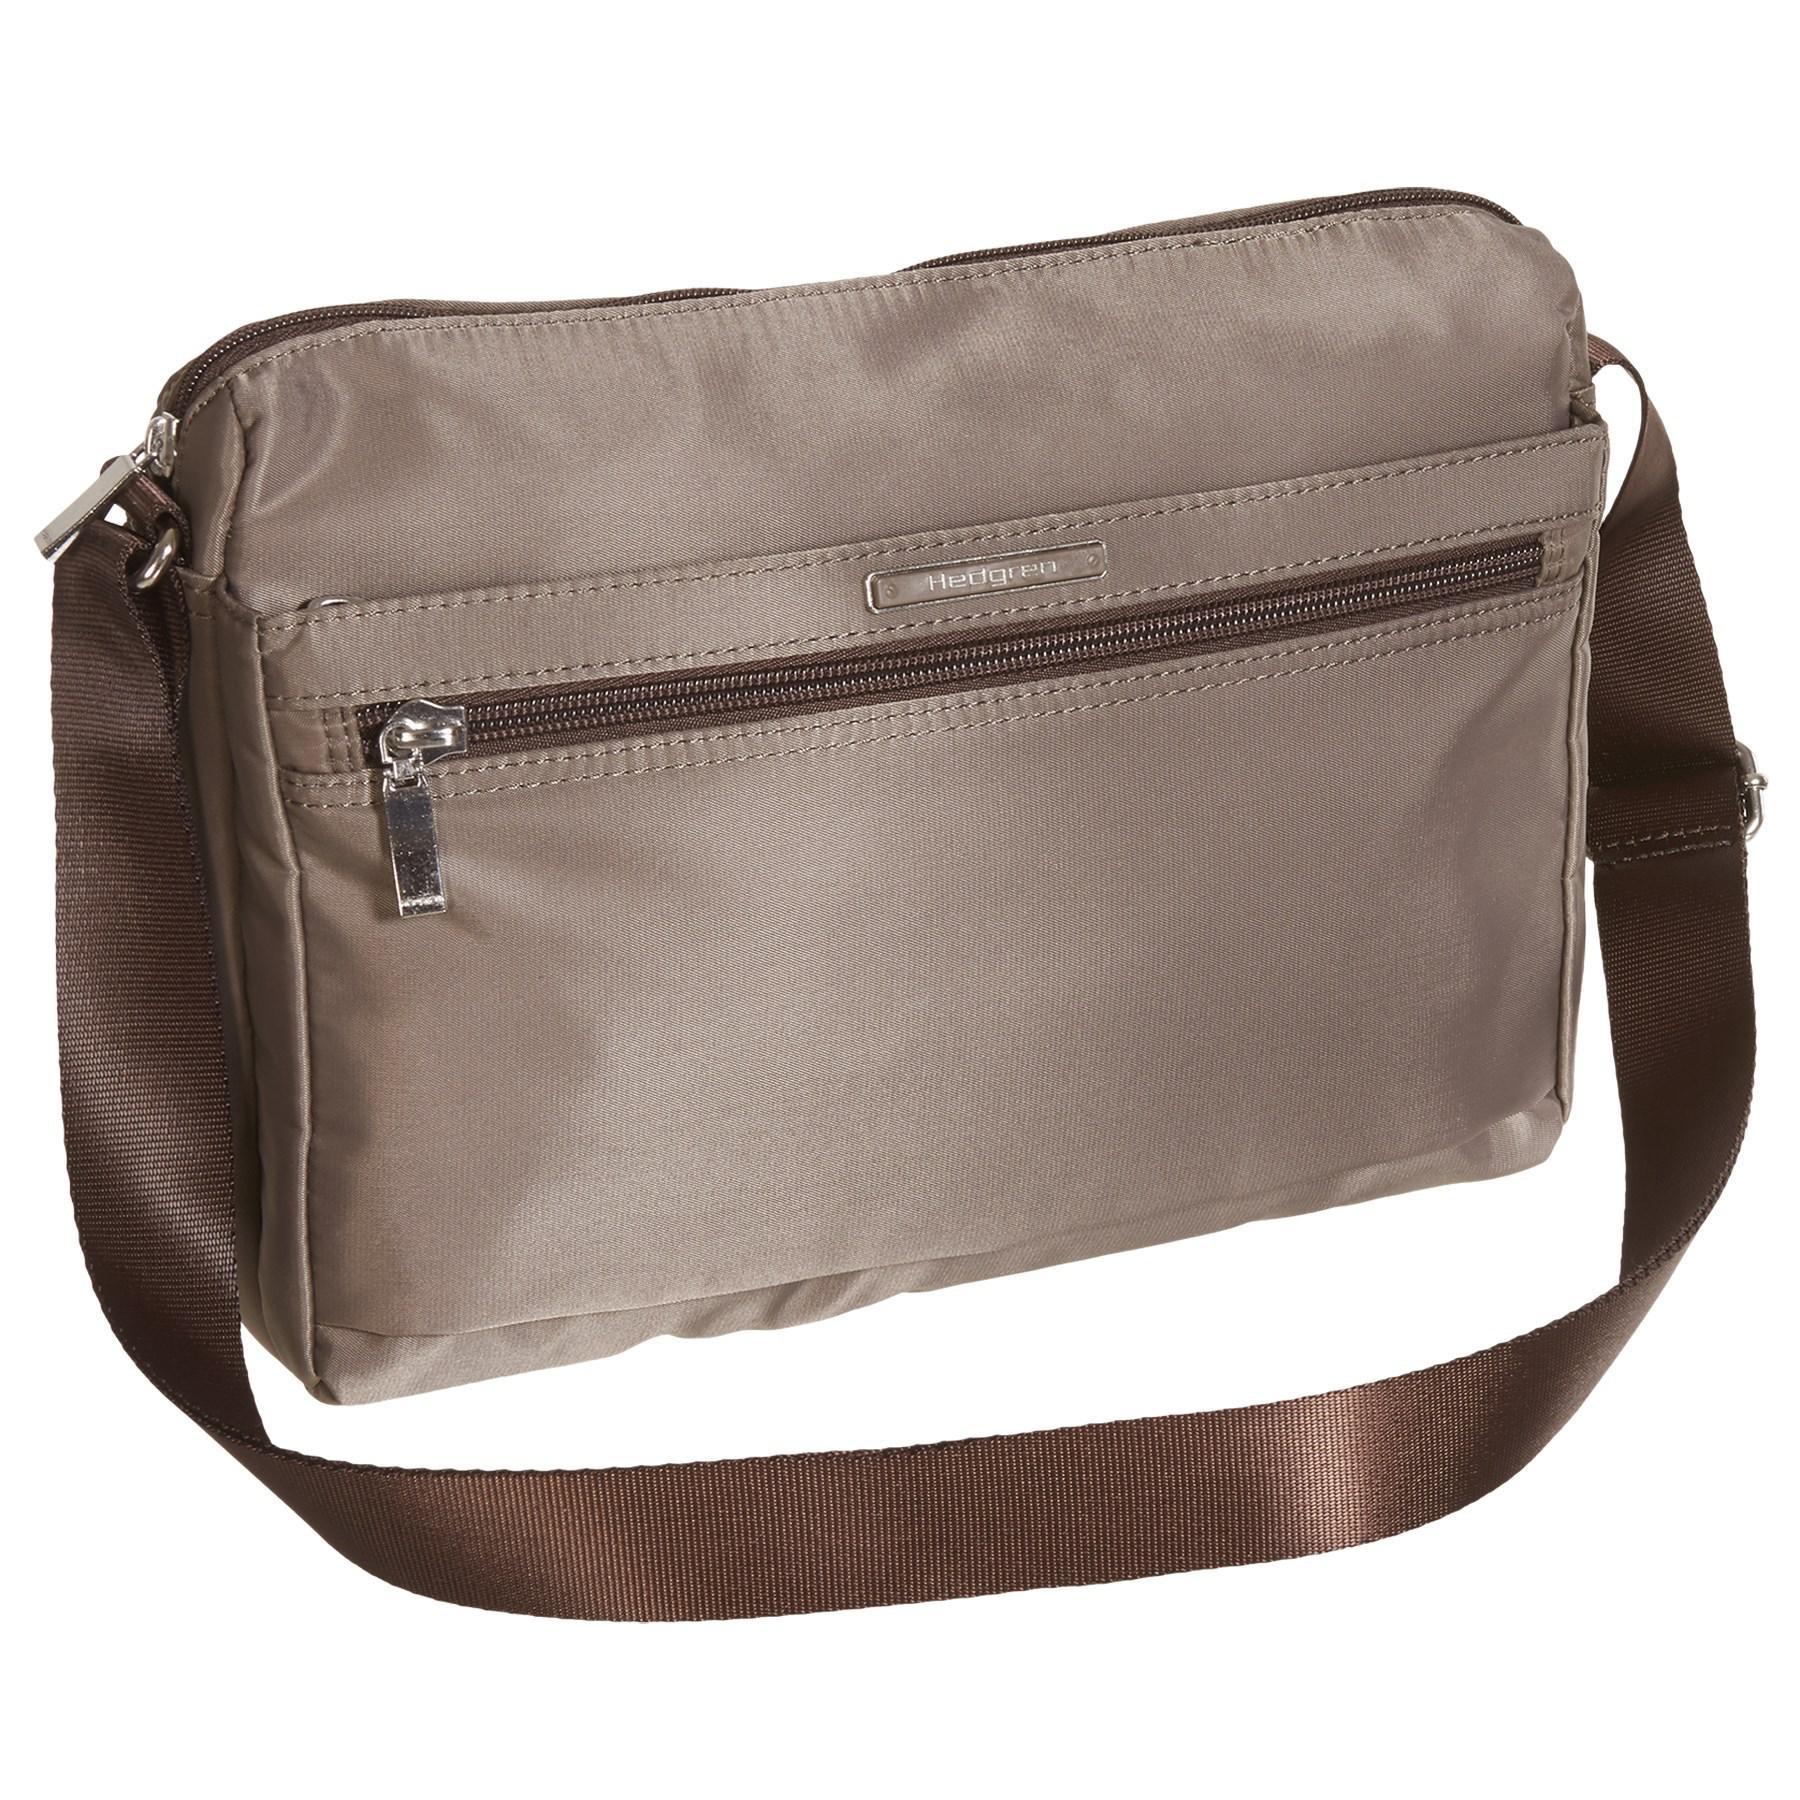 771c2af3a9 Lyst - Hedgren Inner City Eye Medium Rfid Crossbody Bag (for Women)